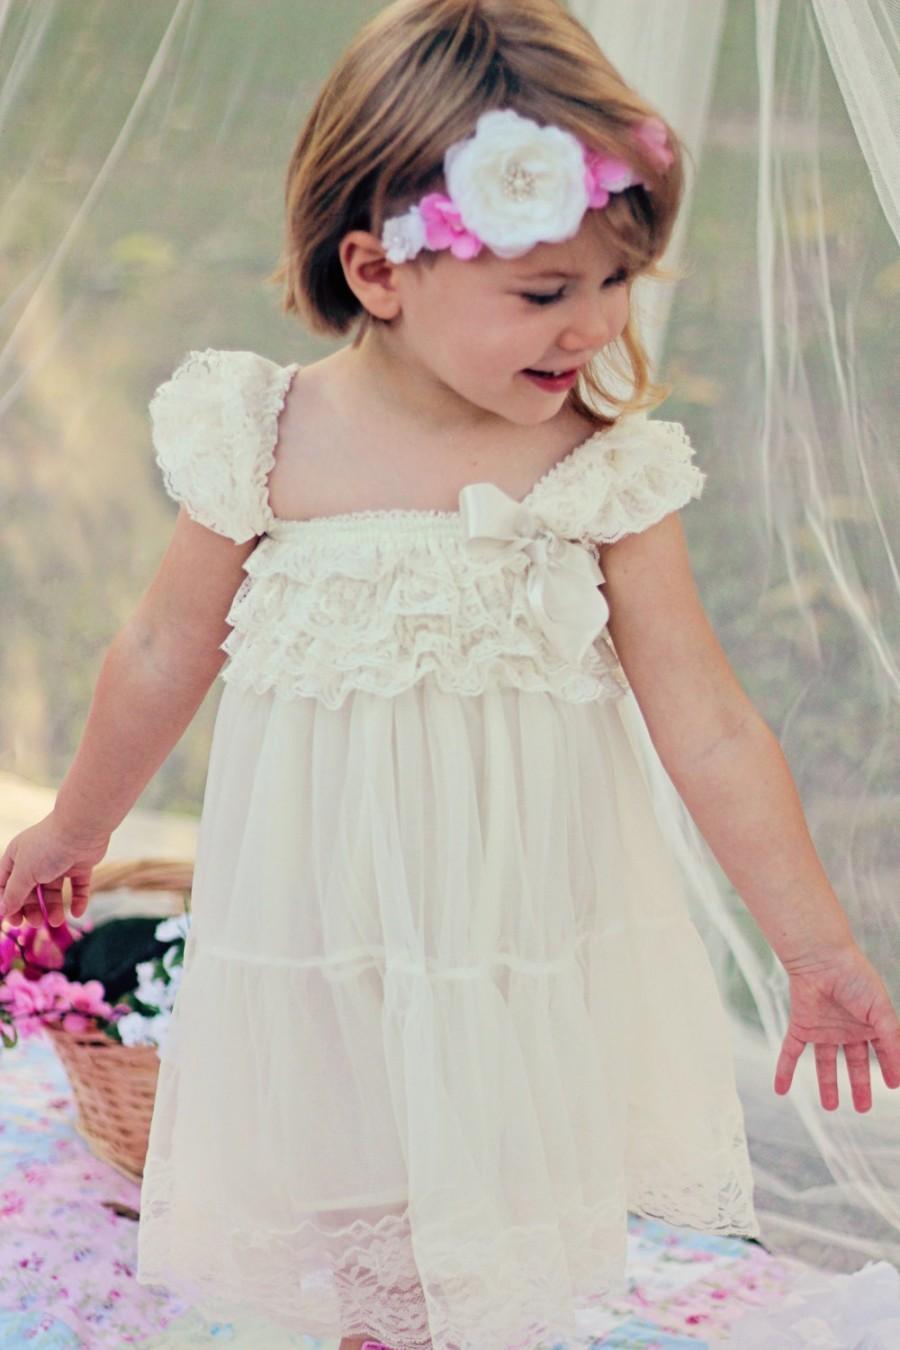 زفاف - Rustic Flower Girl Dress / Country Flower Girl Dress / Lace Petti Dress..Rustic Flower Girl / Ivory Lace Flower Girl Dress / Cream..Wheat .